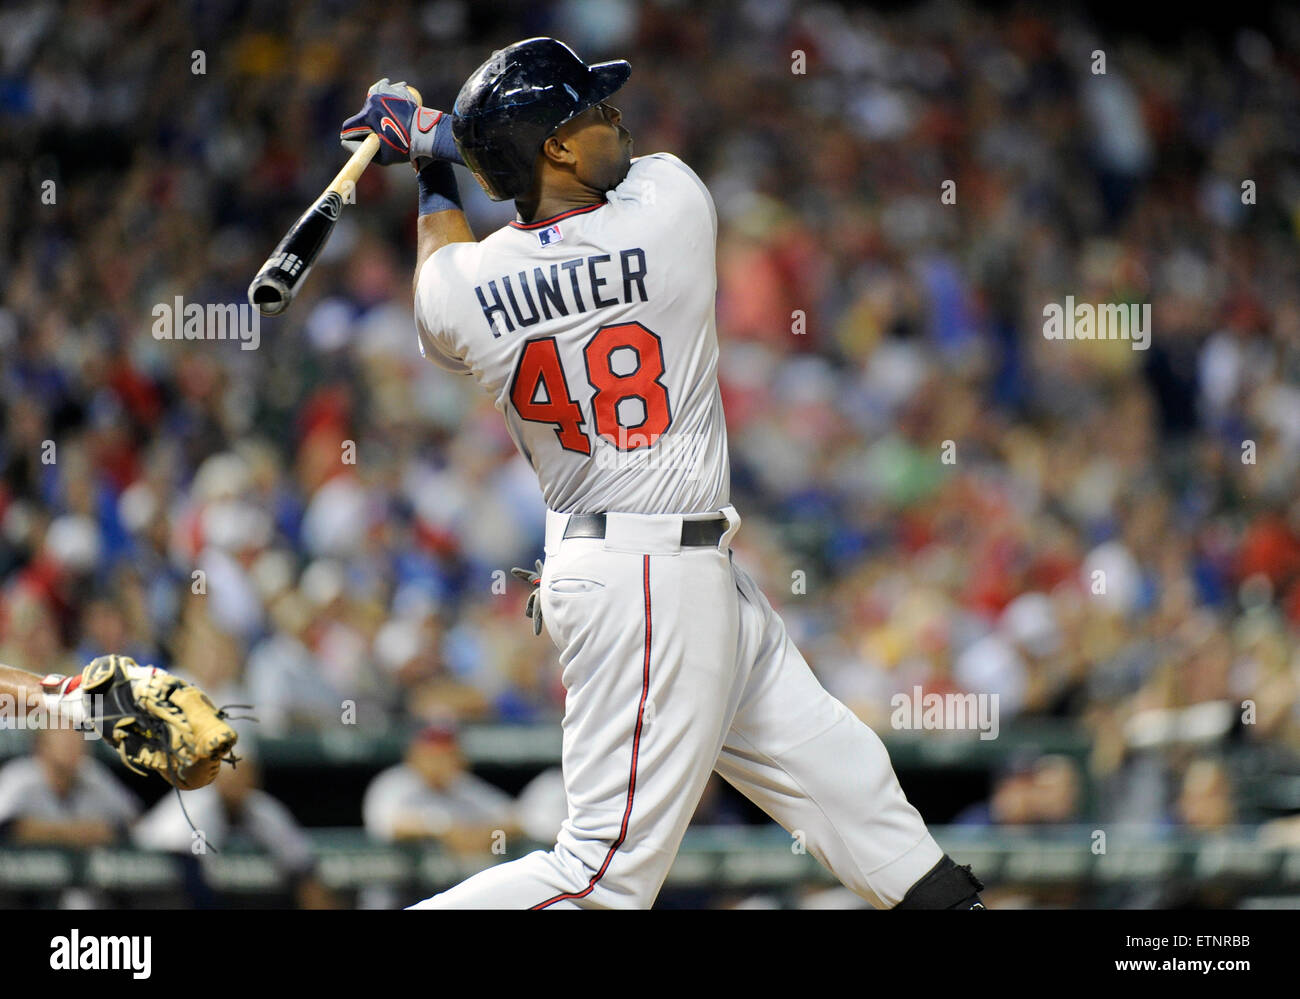 jun 12, 2015: minnesota twins right fielder torii hunter #48 during